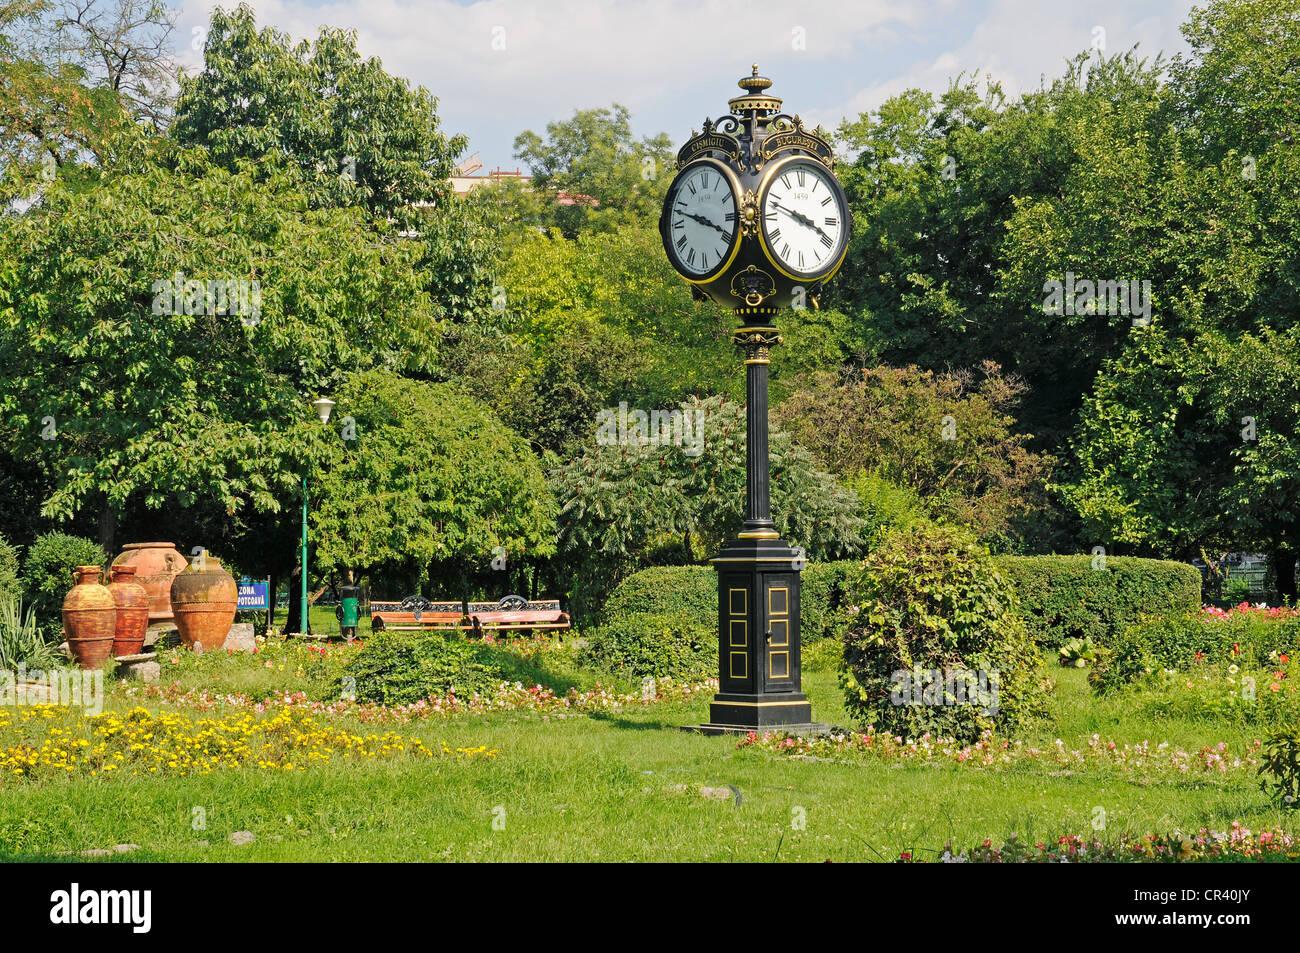 Street clock, Cișmigiu Gardens, Bucharest, Romania, Eastern Europe, Europe, PublicGround - Stock Image